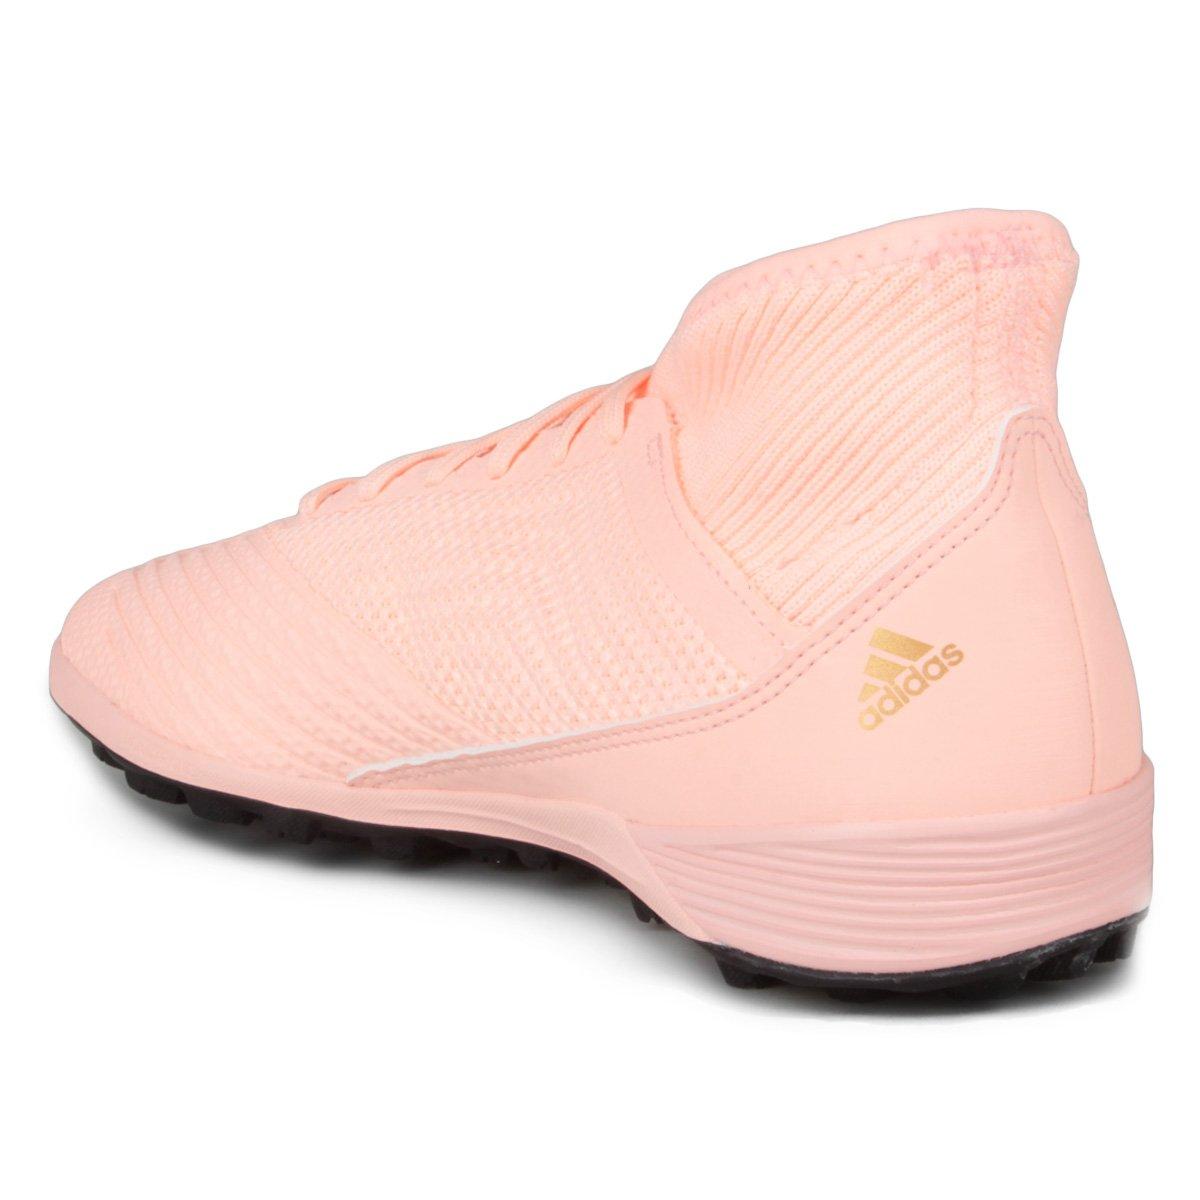 Chuteira Society Adidas Predator TAN 18 3 TF - Rosa e Preto - Compre ... ac3aa93f88676